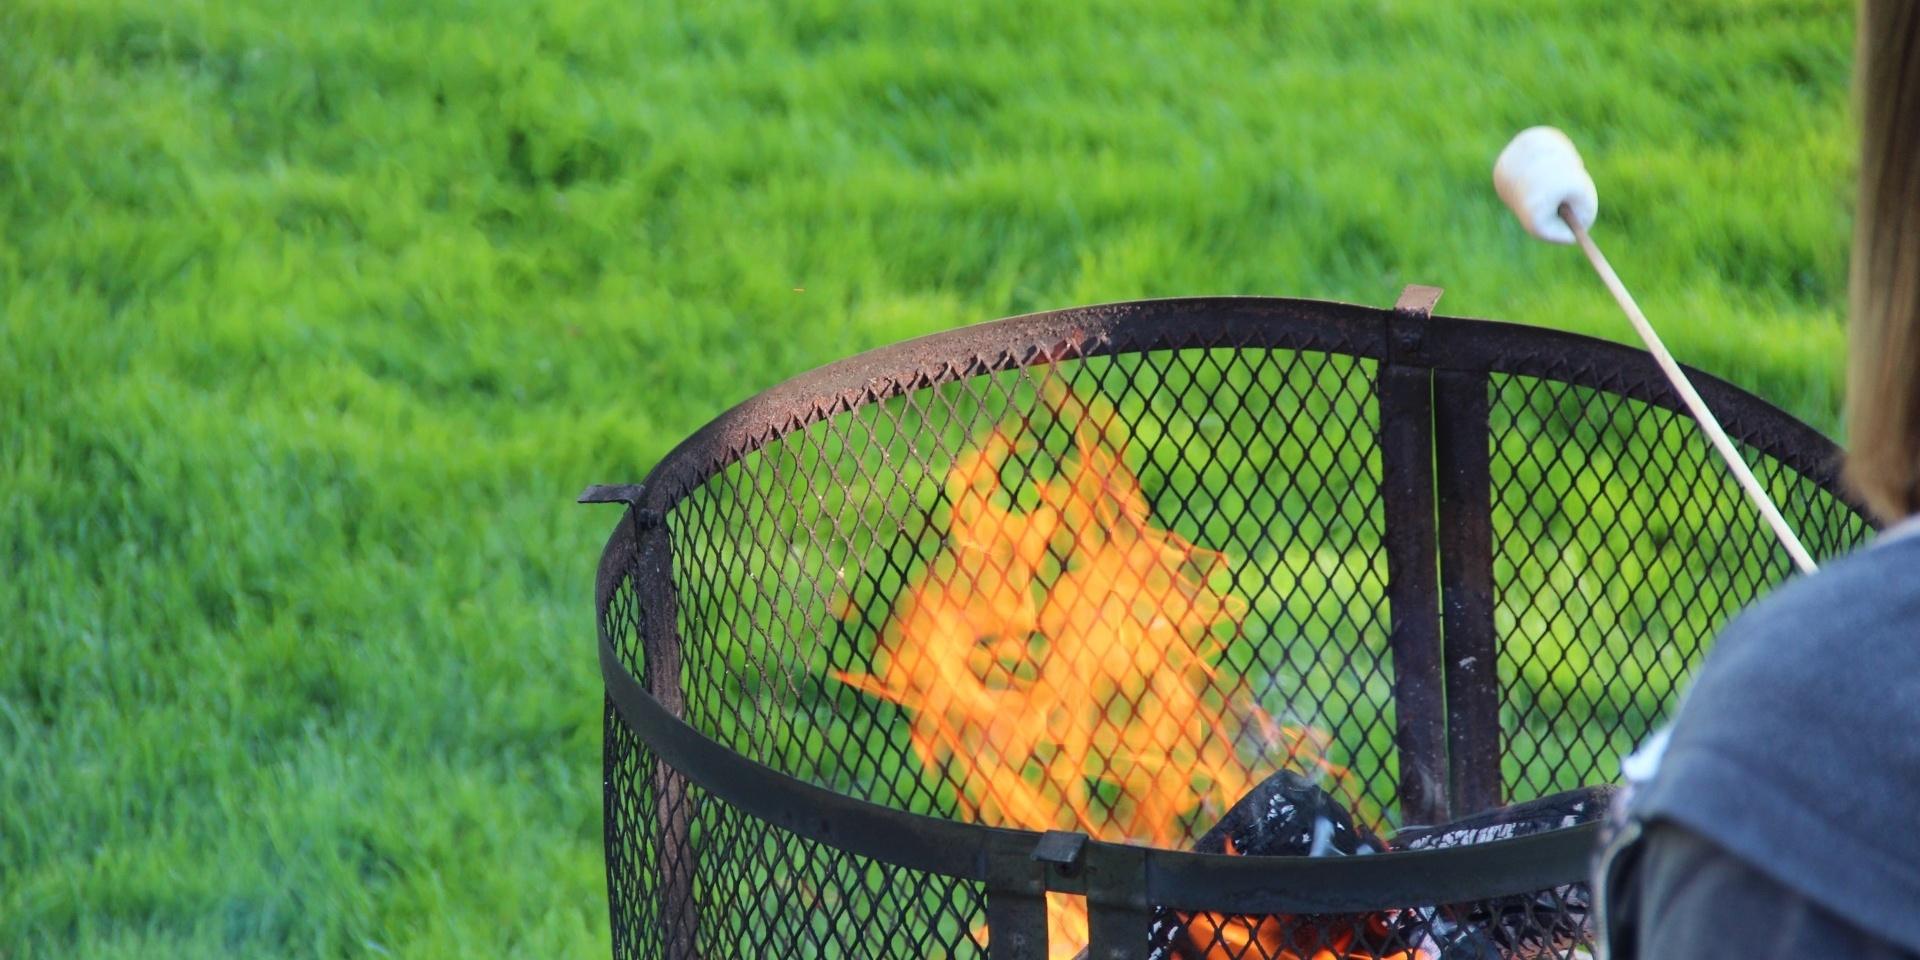 backyard-fun-toast-marshmallows.jpg